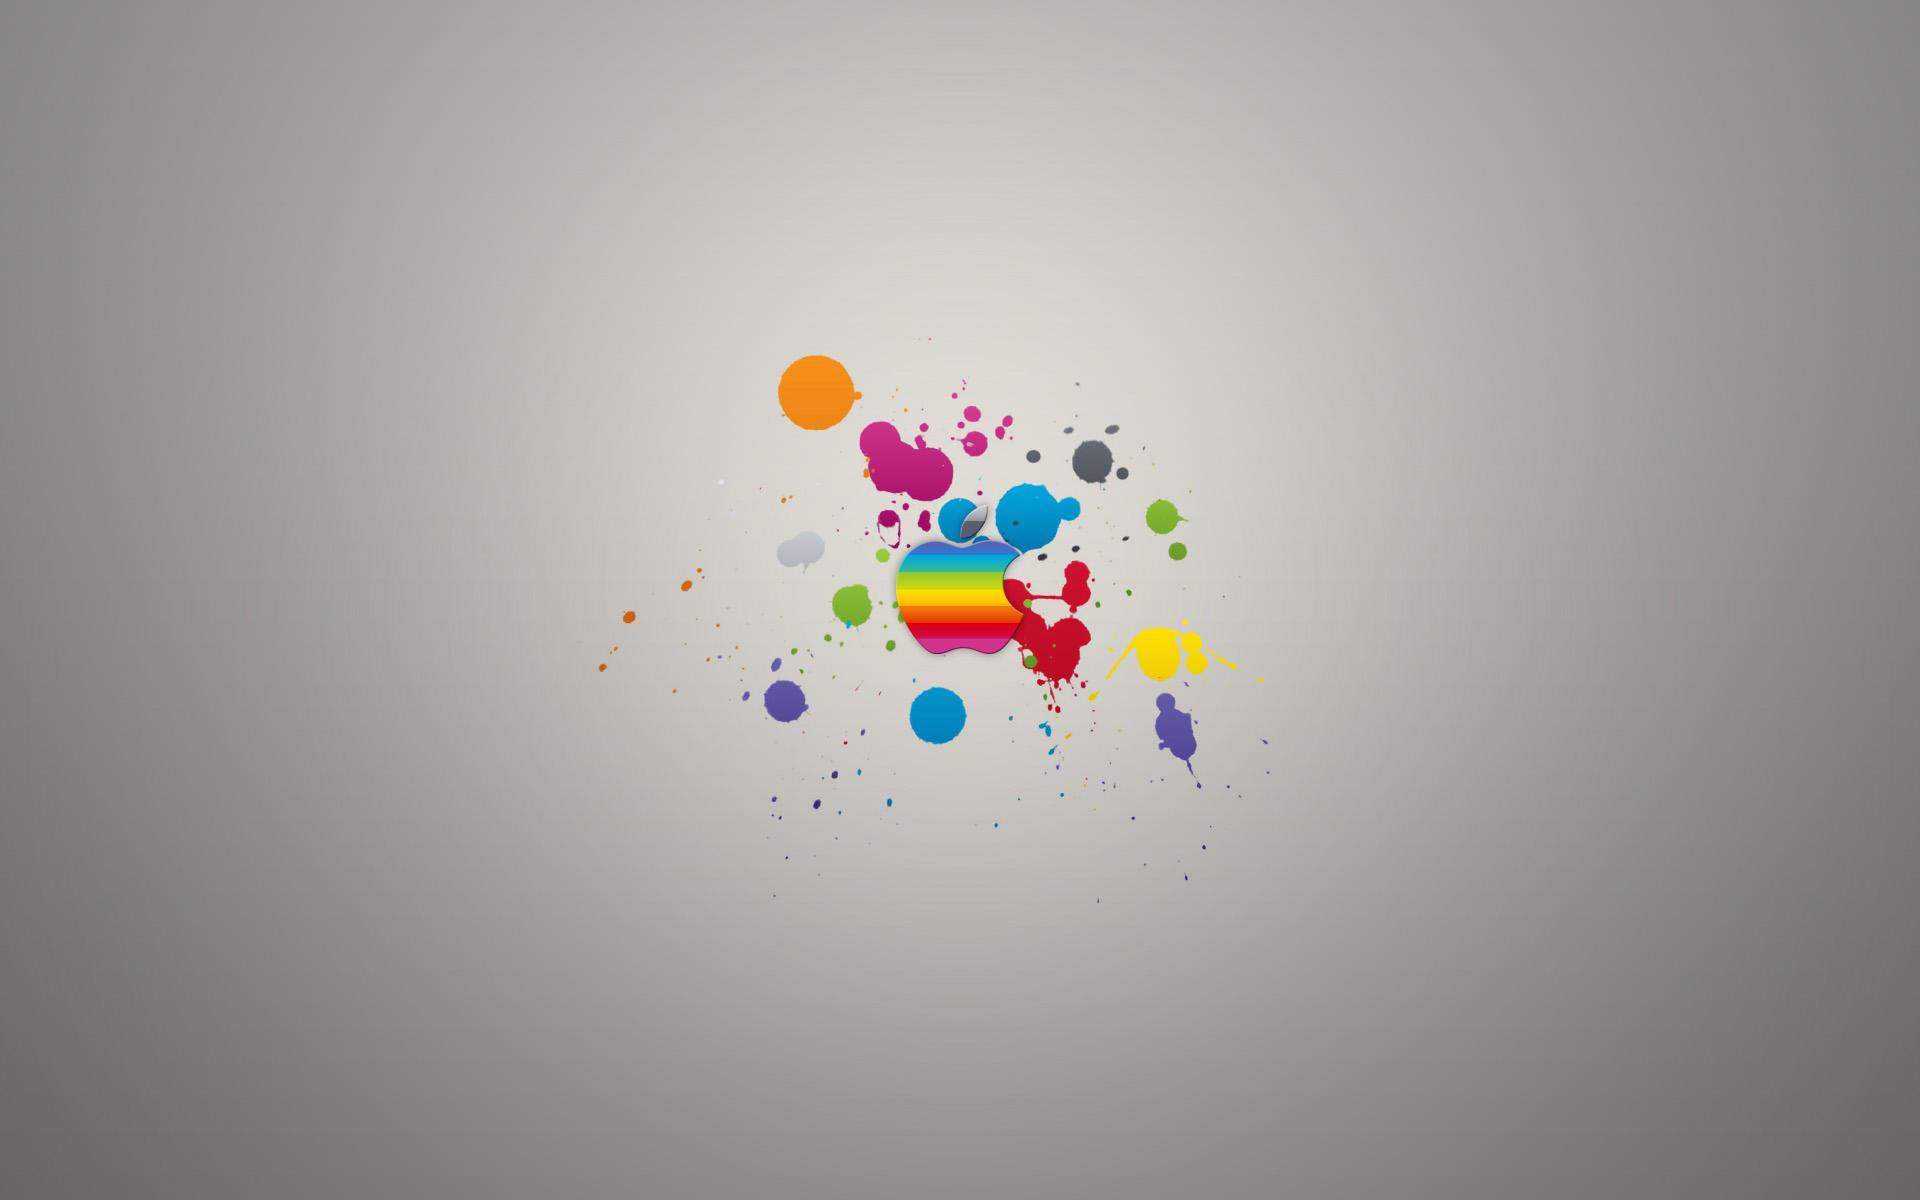 hd wallpapers for mac wallpapers for mac desktop wallpaper for mac 1920x1200